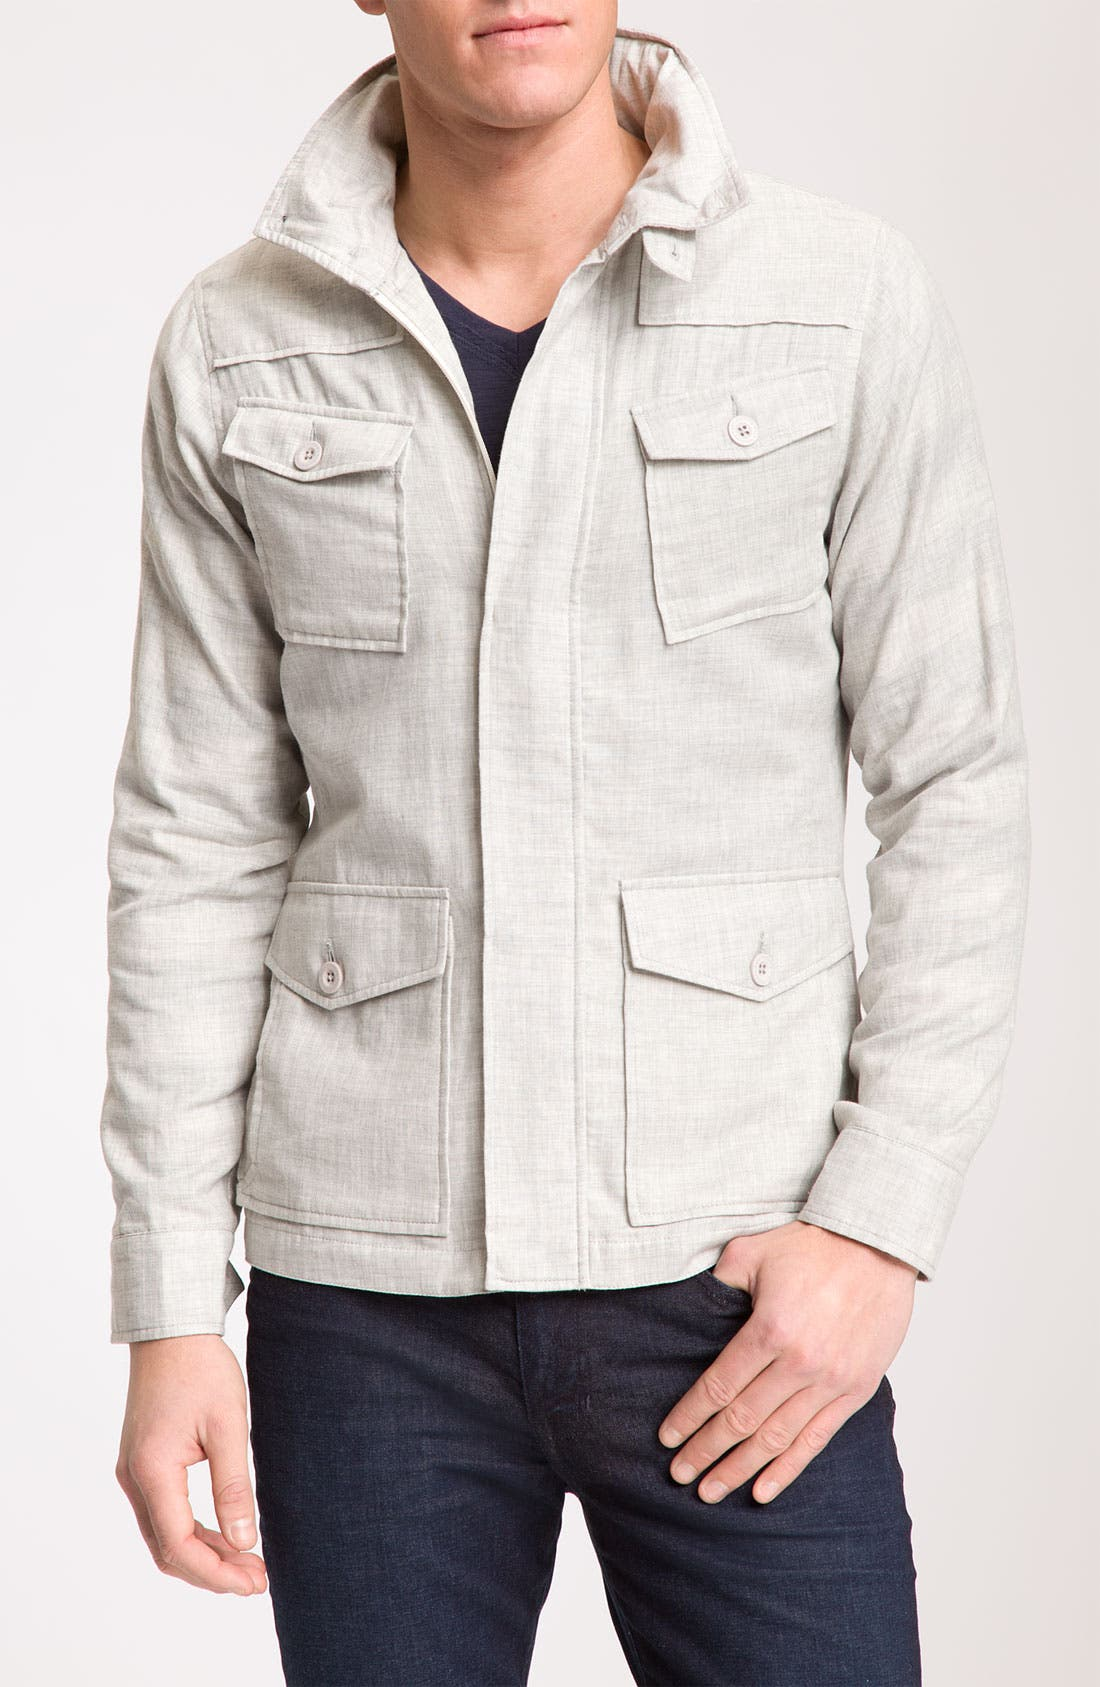 Main Image - Kane & Unke Trim Fit Cotton Jacket